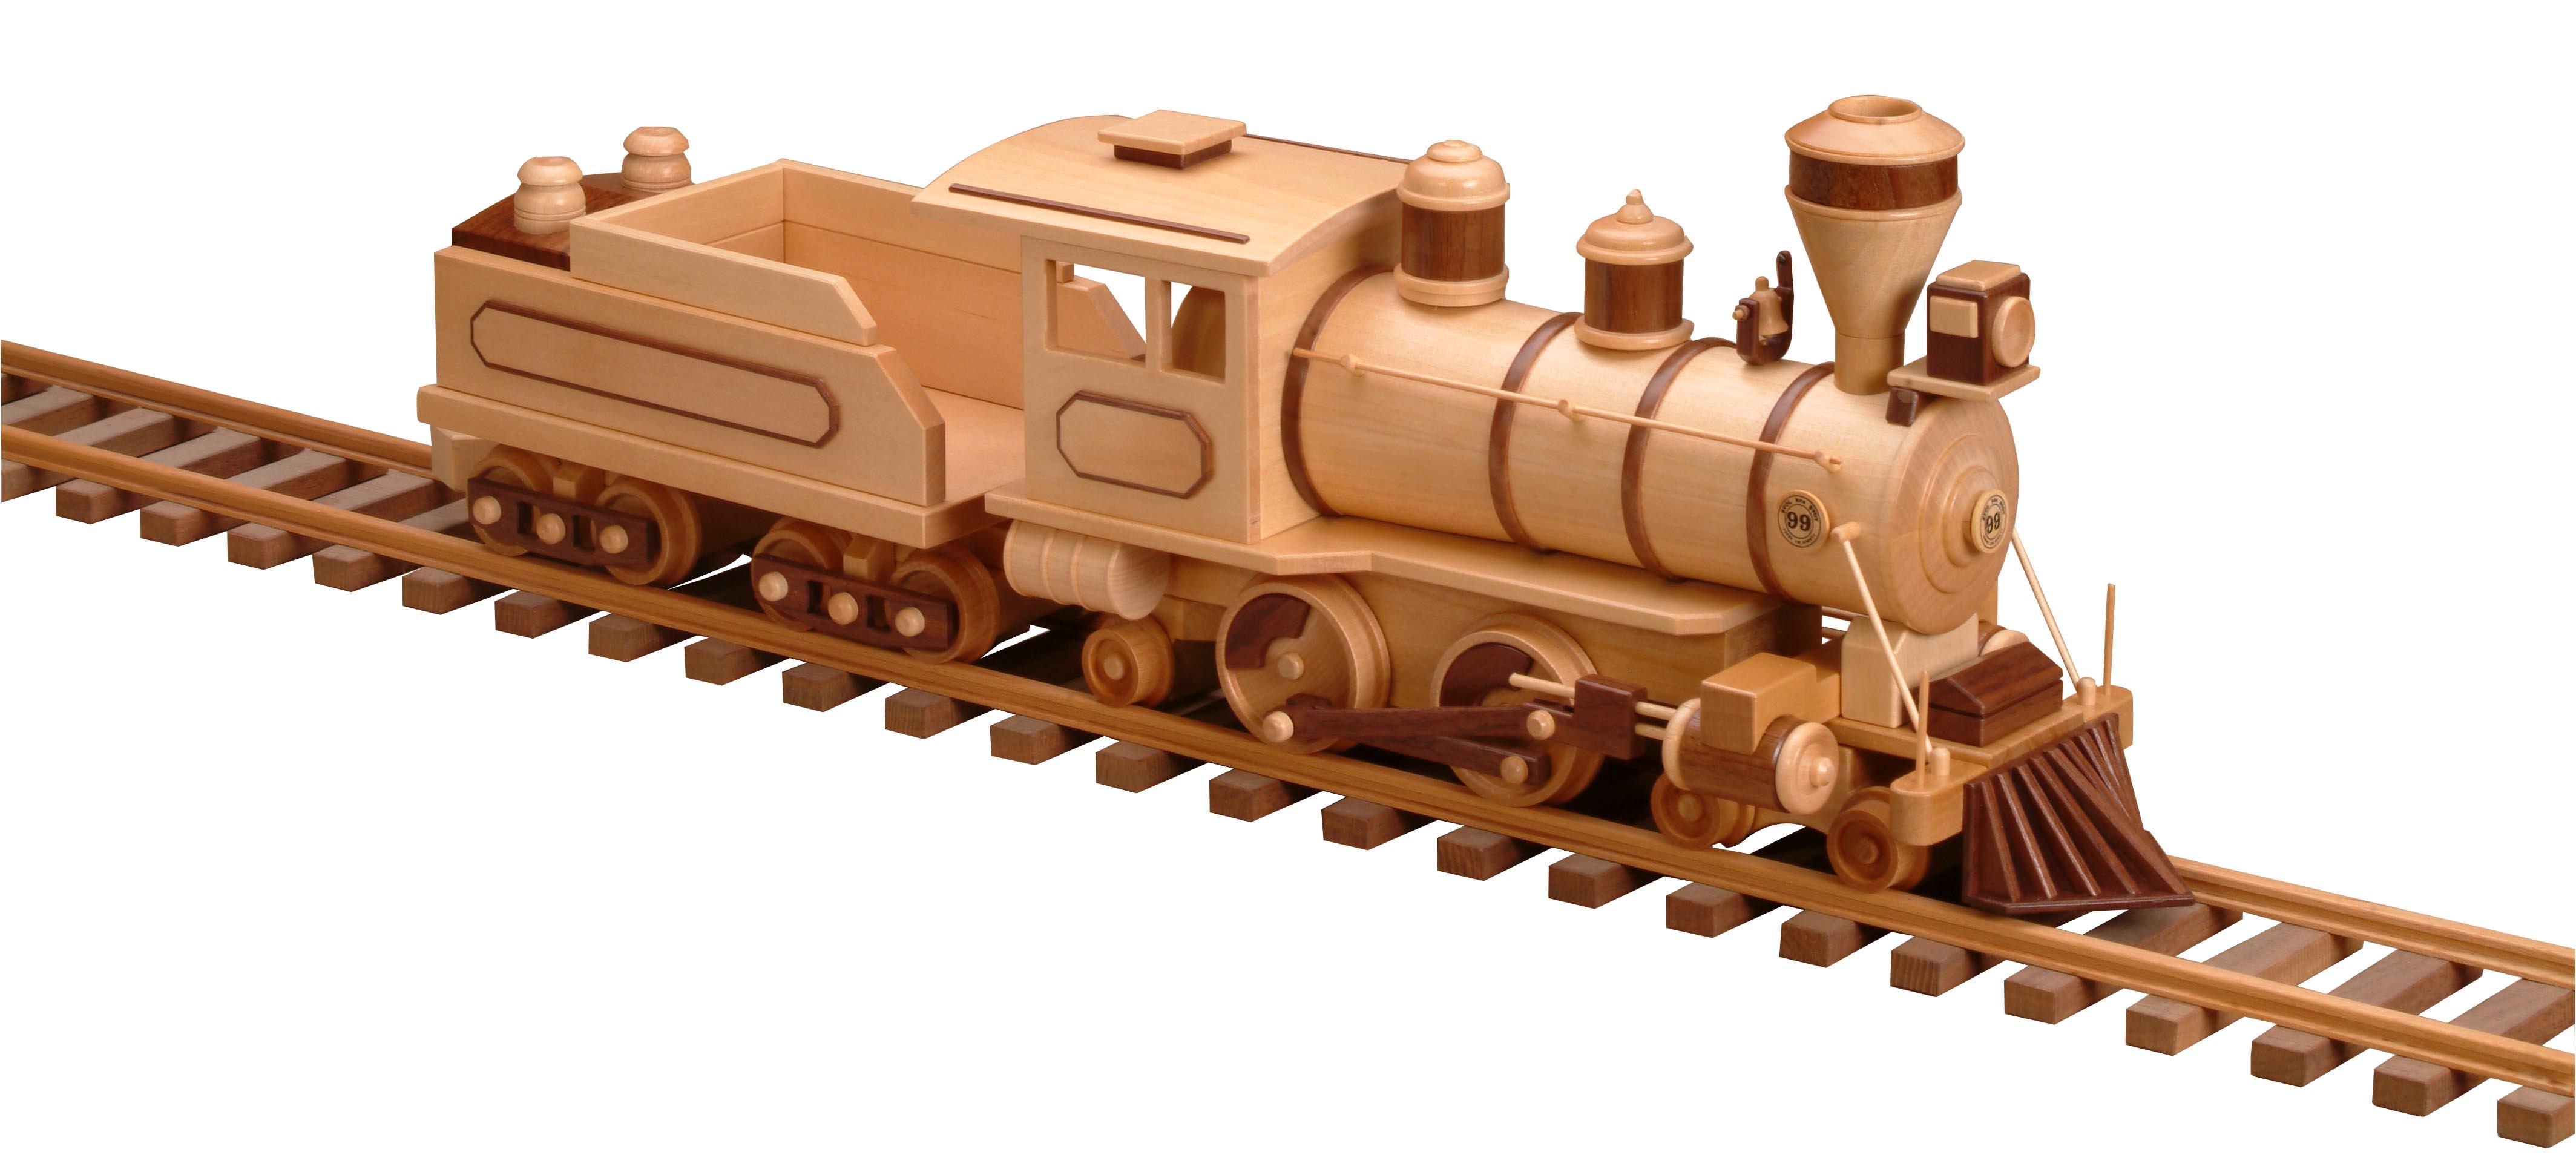 patterns & kits :: trains :: 99 - locomotive & tender (wood